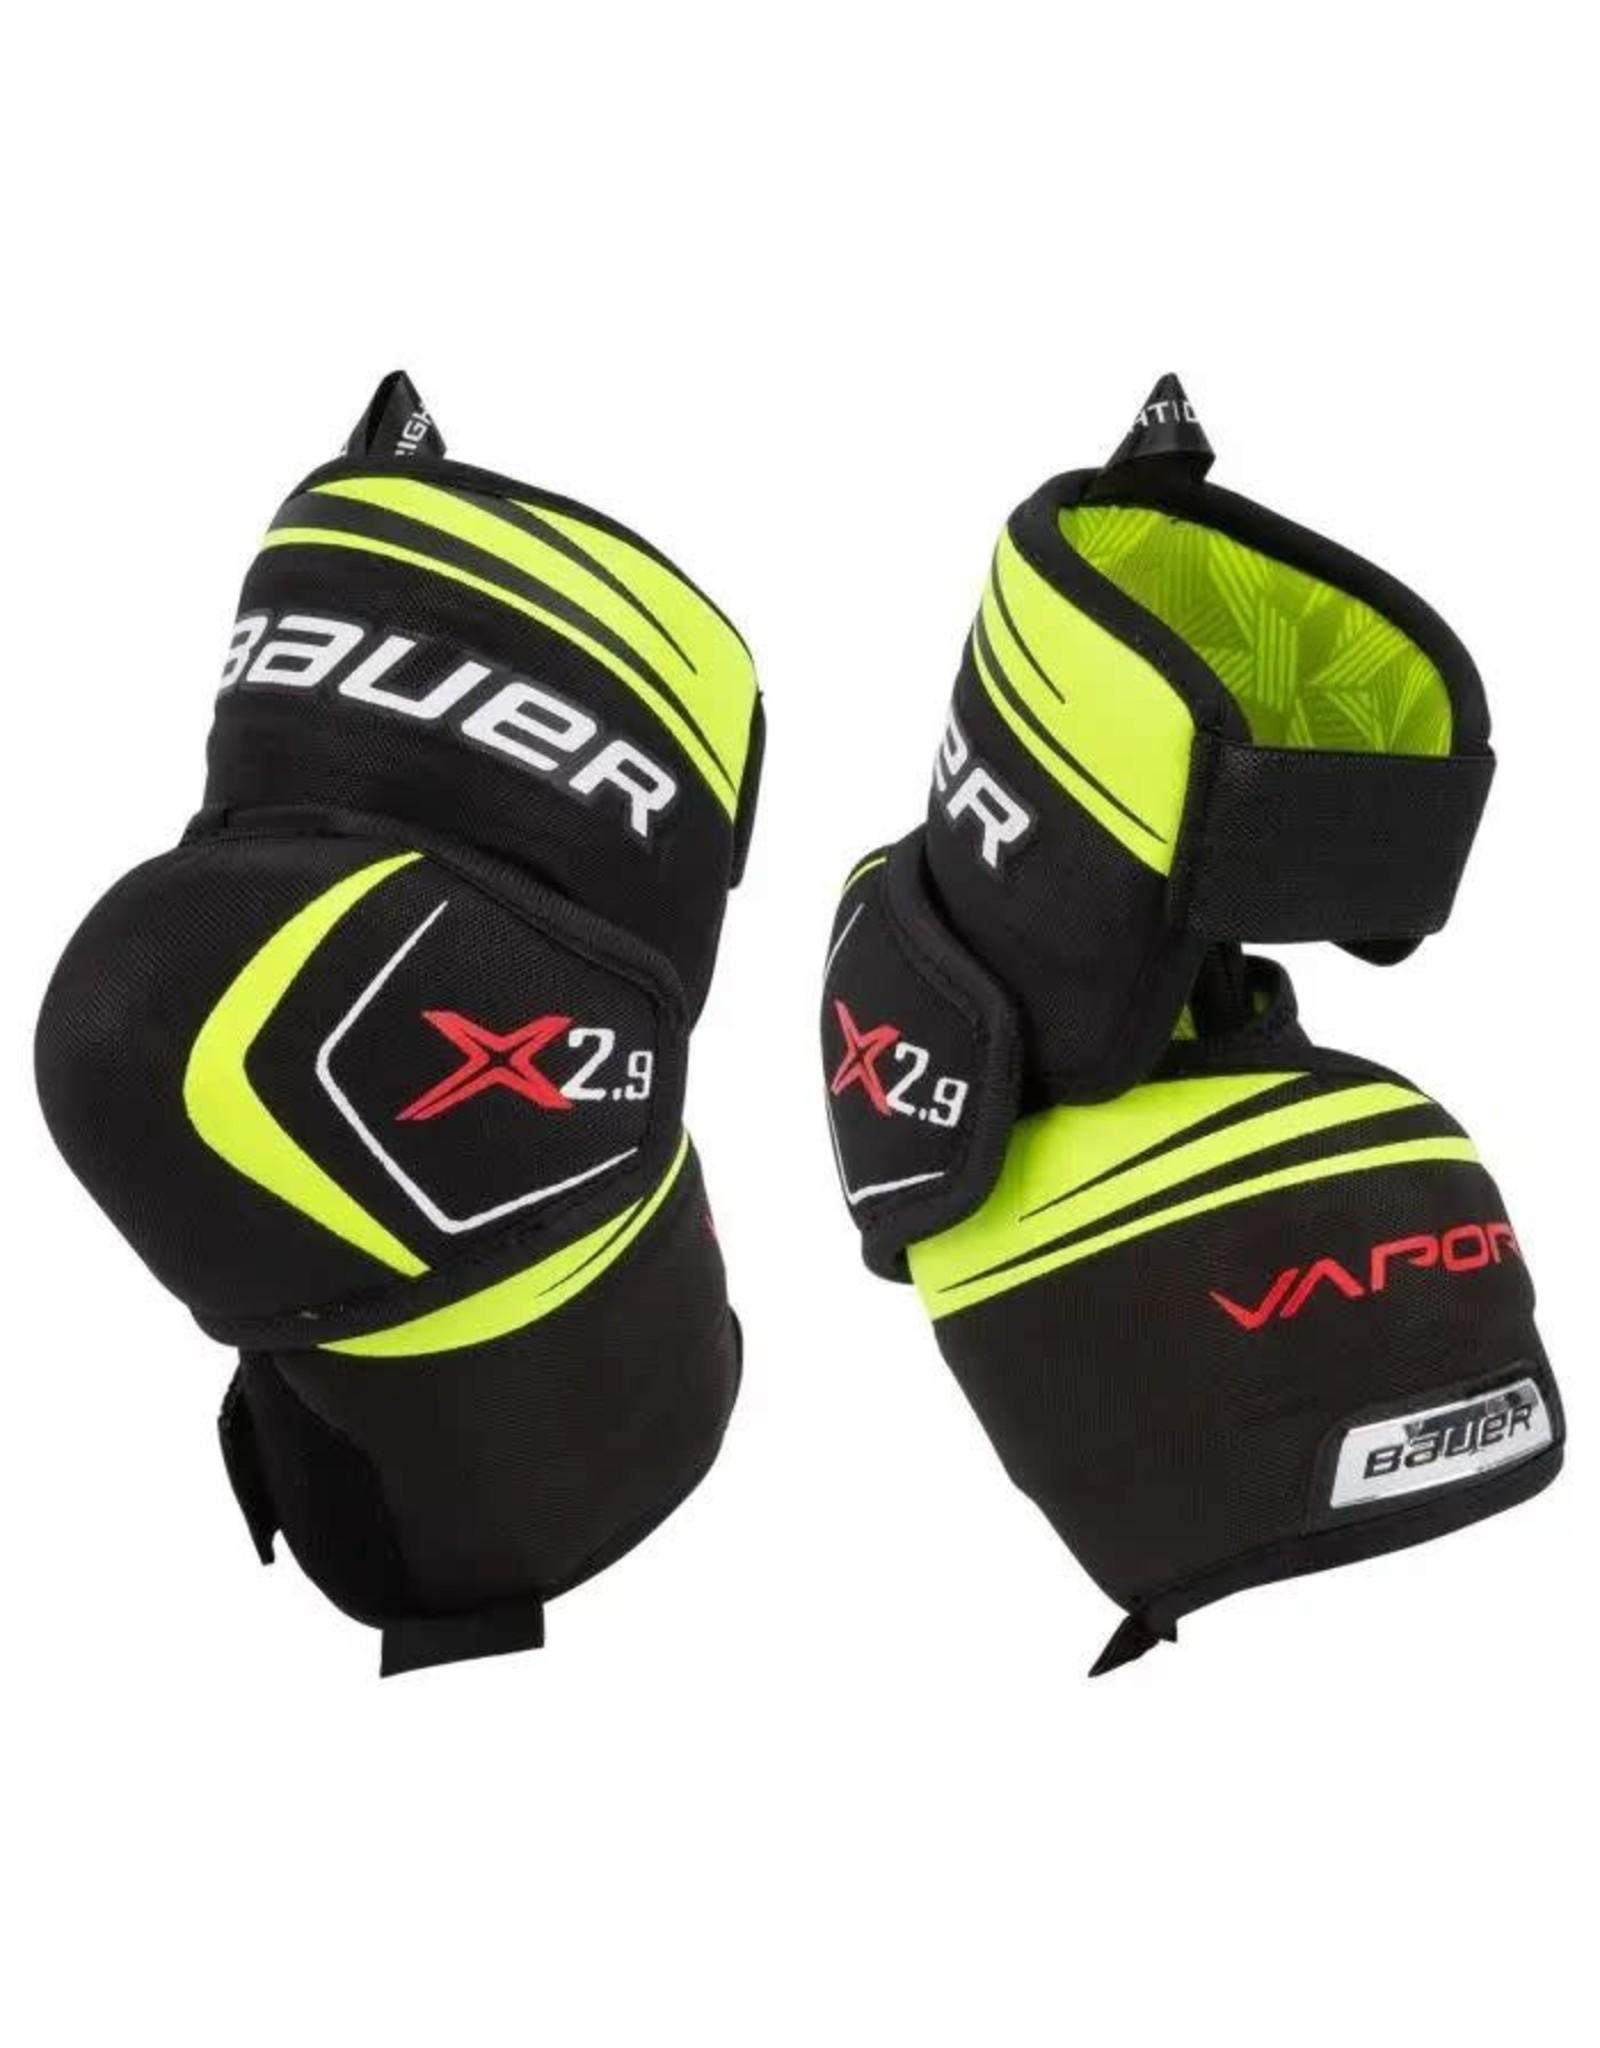 BAUER Vapor X2.9. Junior, Elbow Pads